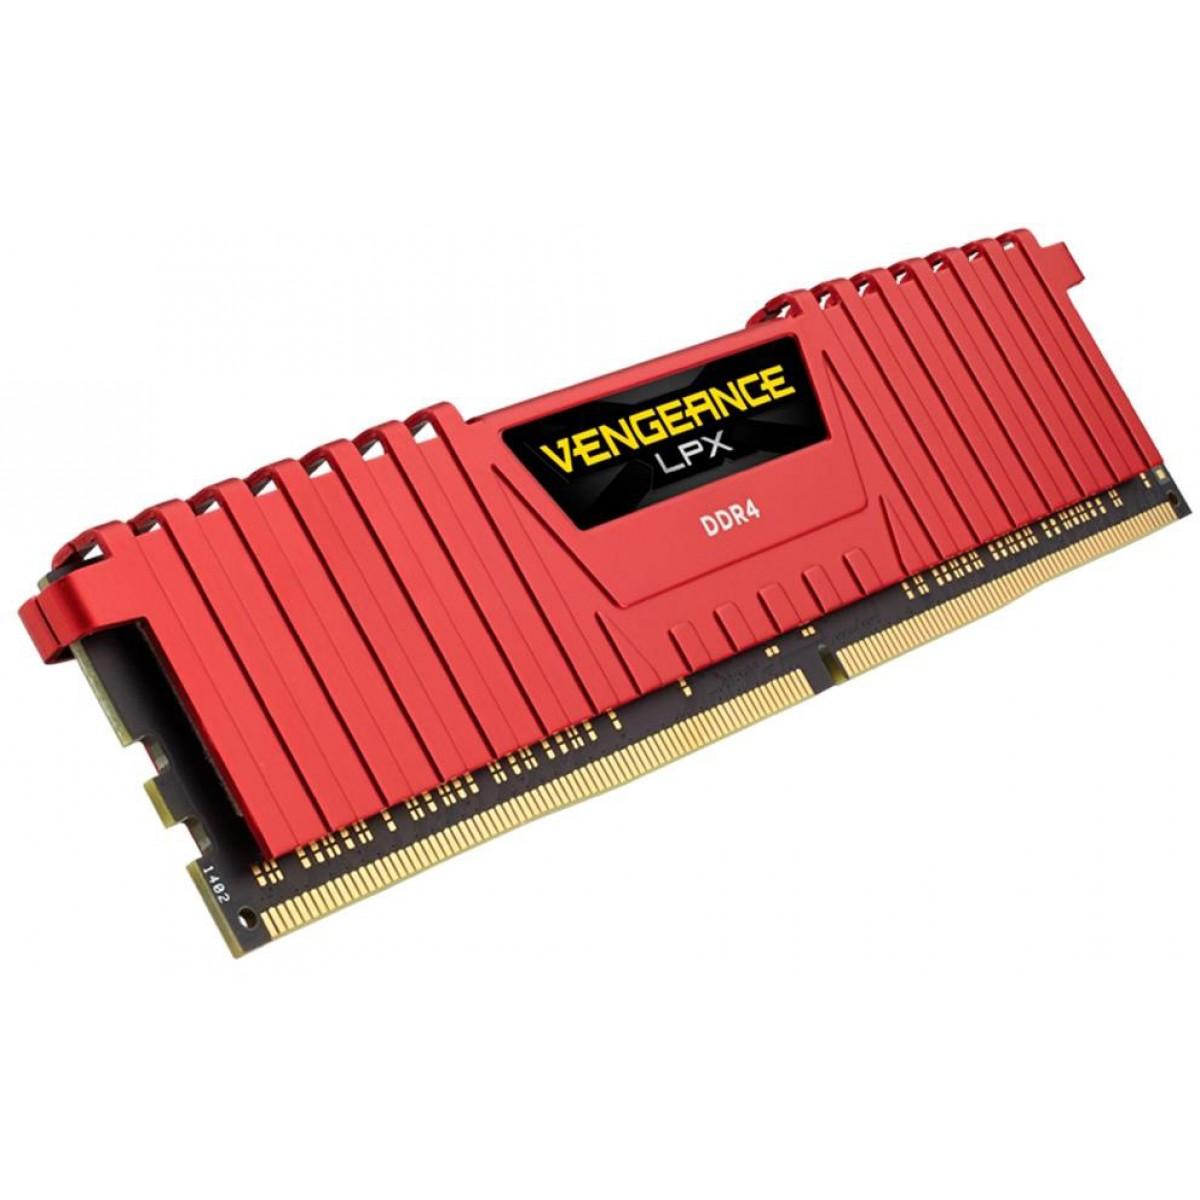 Memória DDR4 Corsair Vengeance LPX, 32GB (2X16GB) 3000MHz, CMK32GX4M2B3000C15R